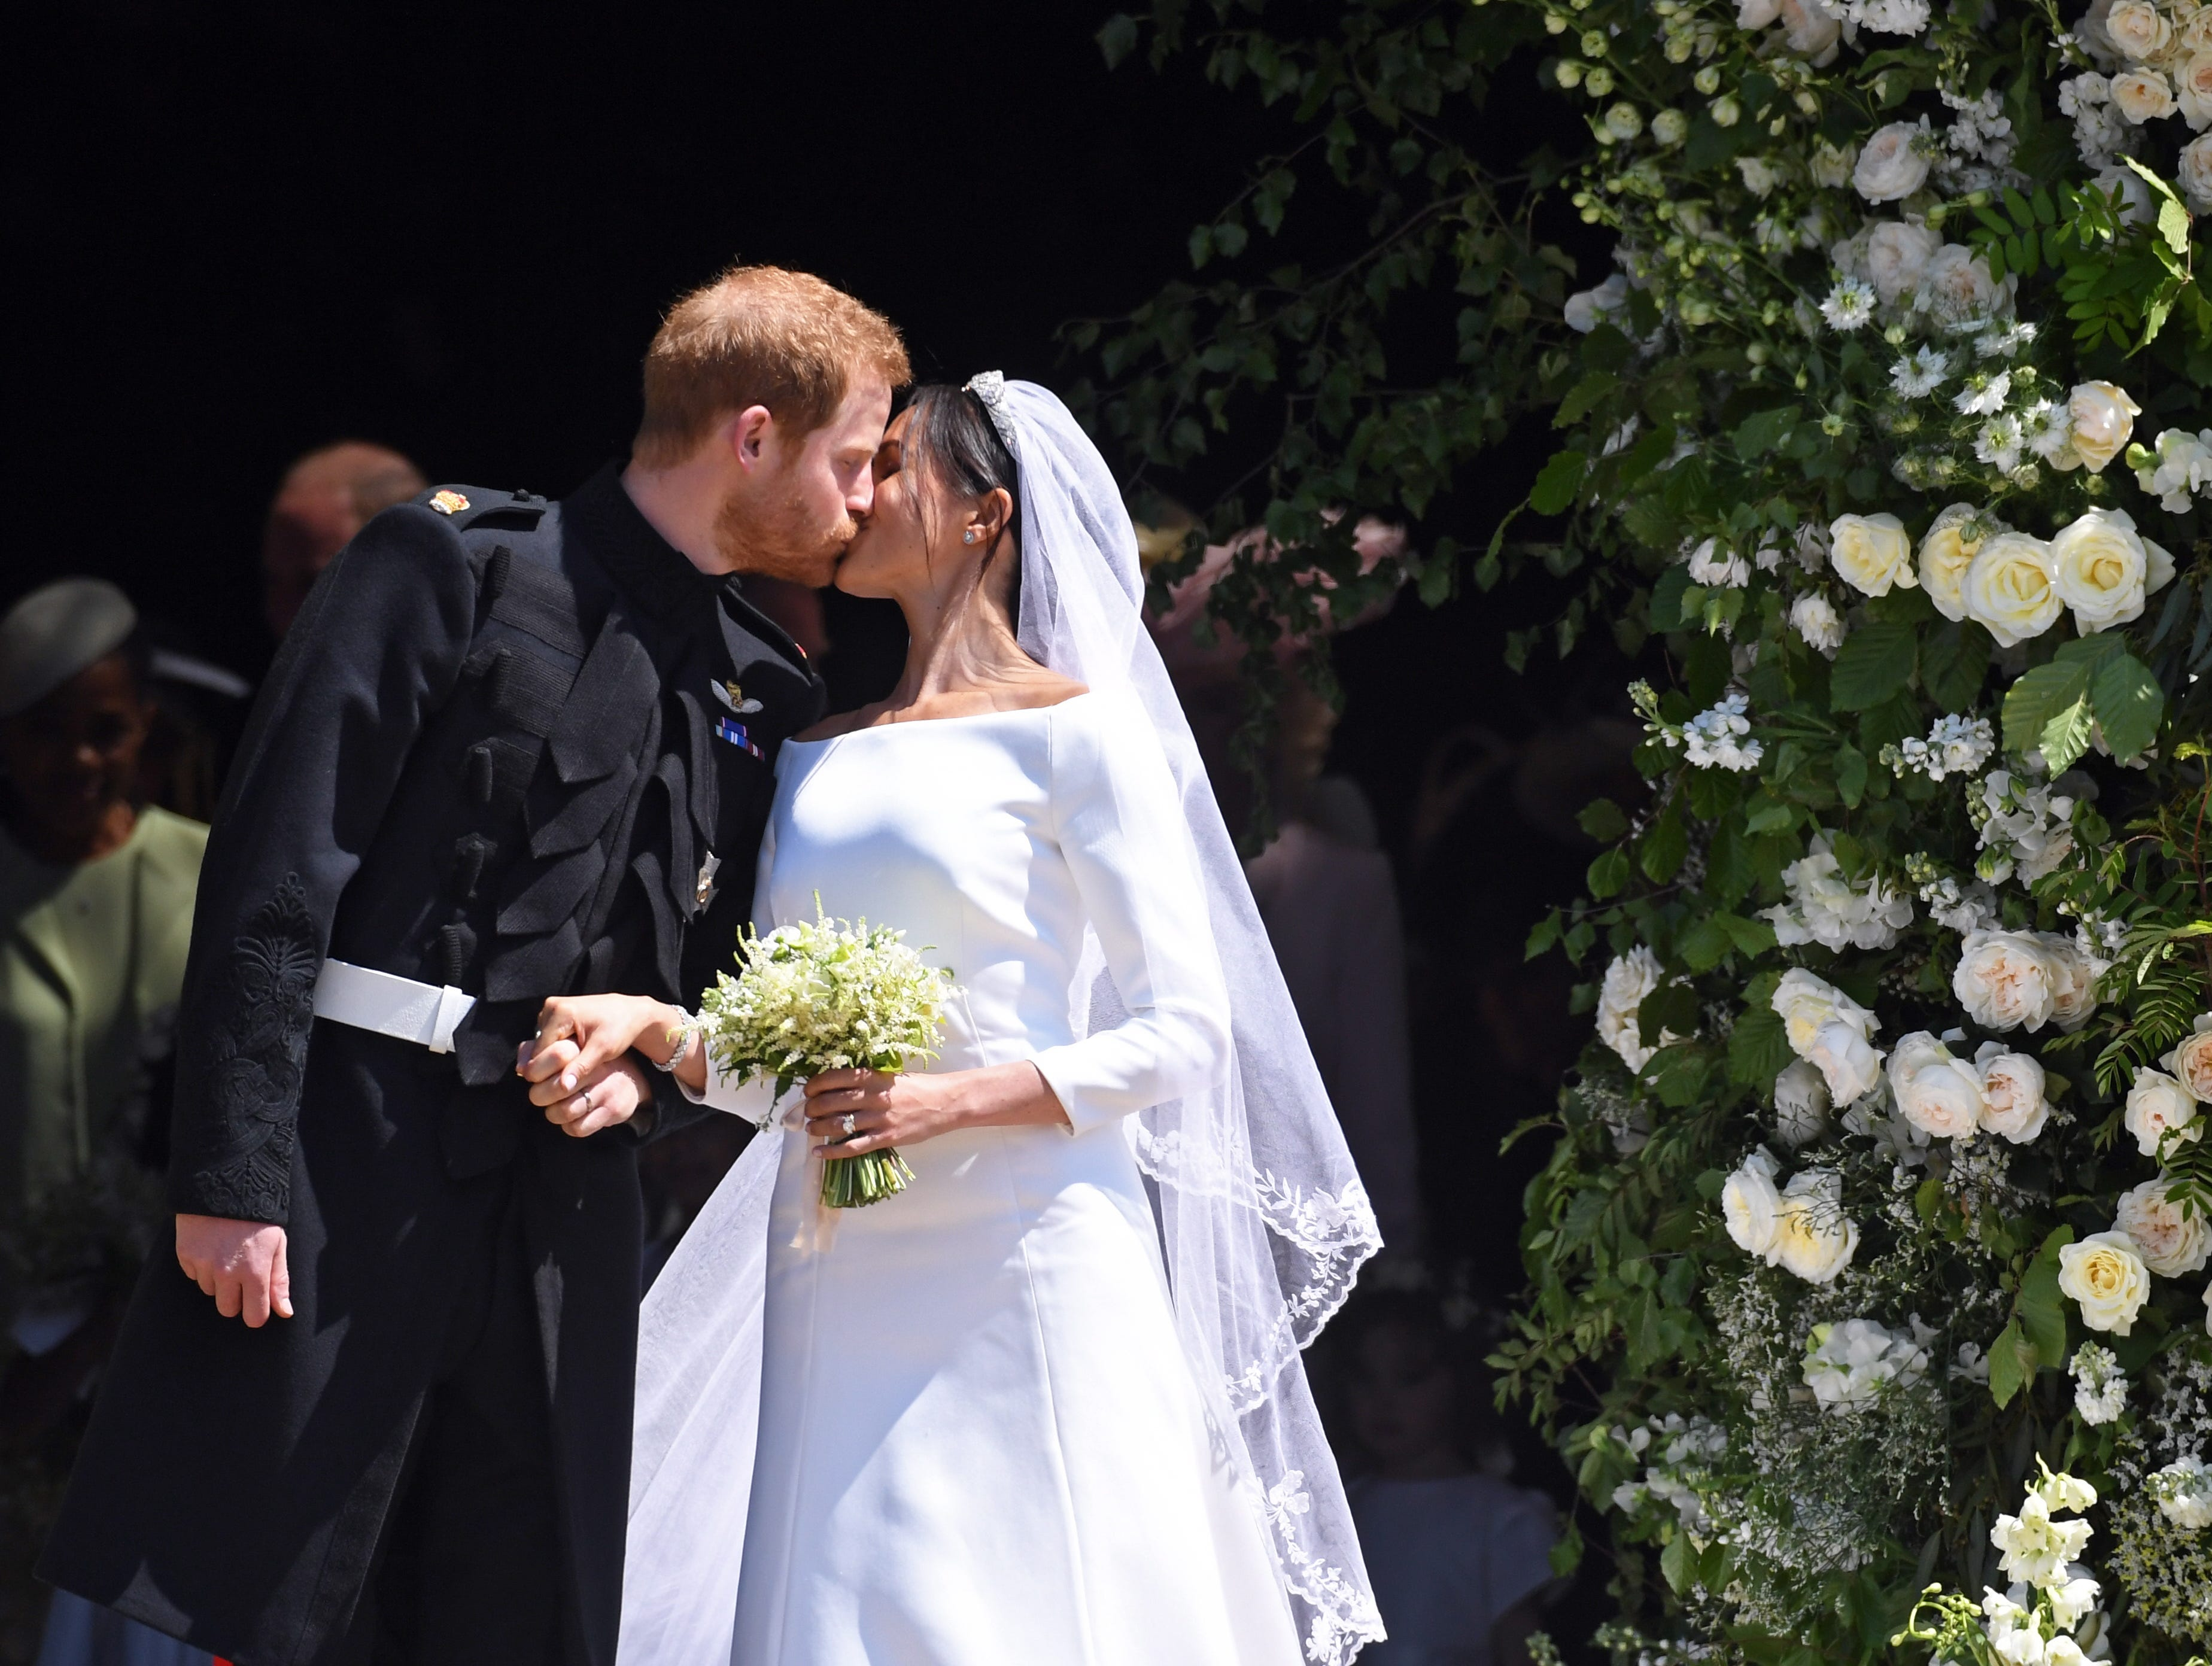 3rd wedding protocol